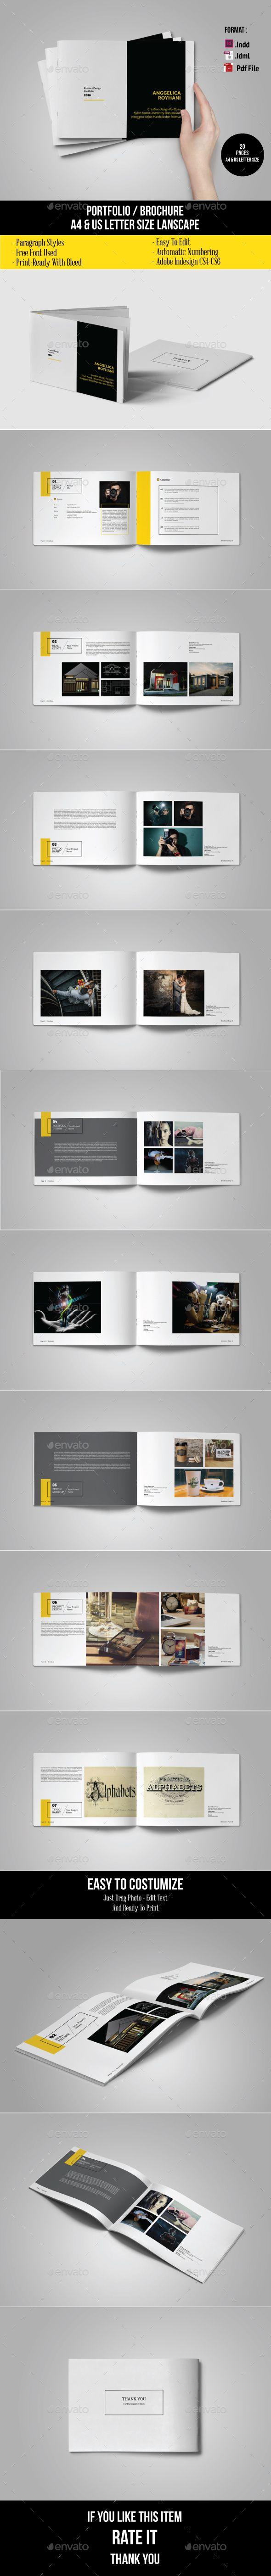 Multipurpose Portfolio Template | Brochure template, Brochures and ...